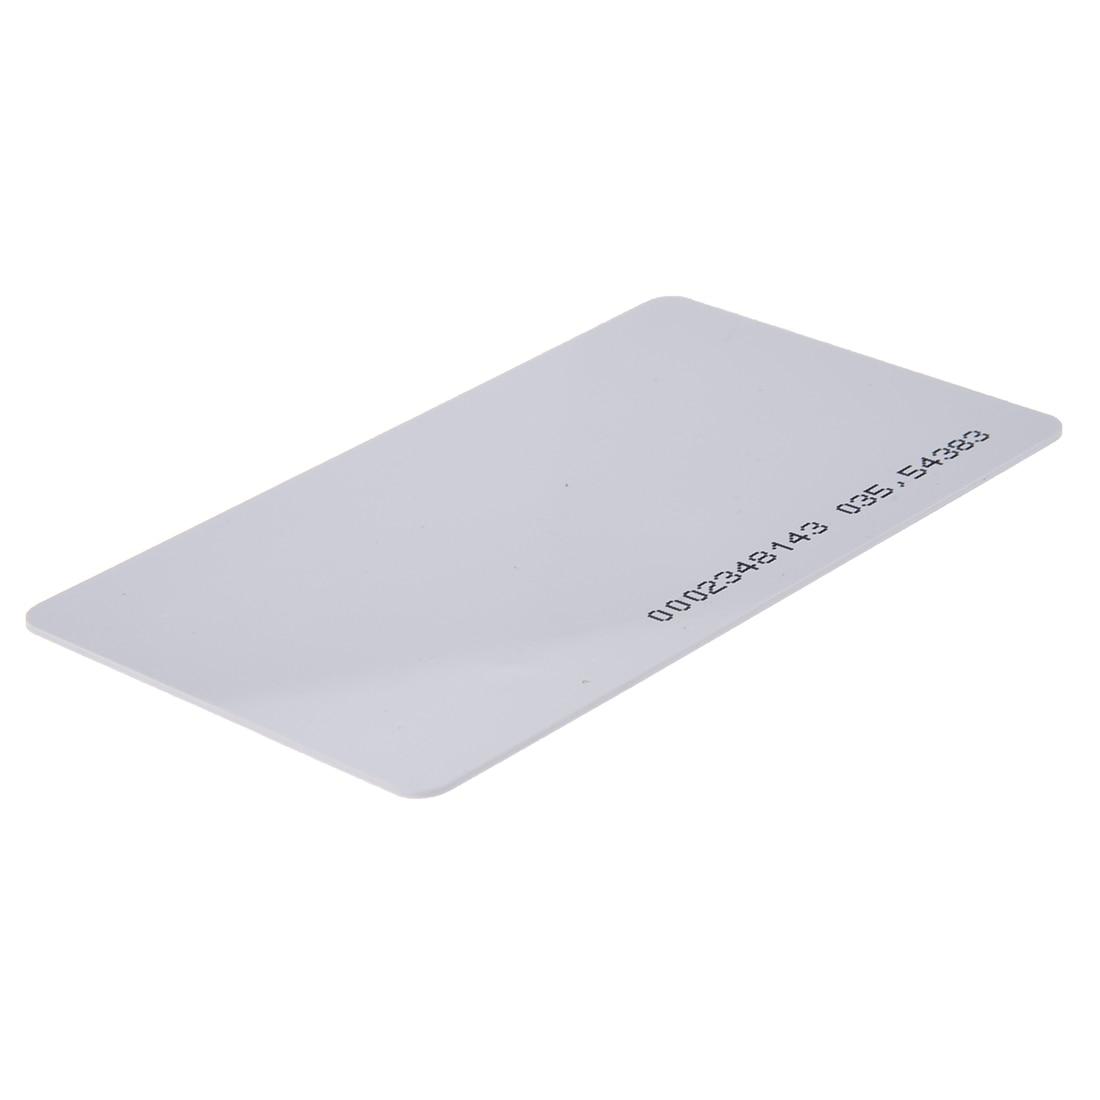 2 Packs 125Khz Door Entry Access Proximity RFID Card Wht 10 Pcs